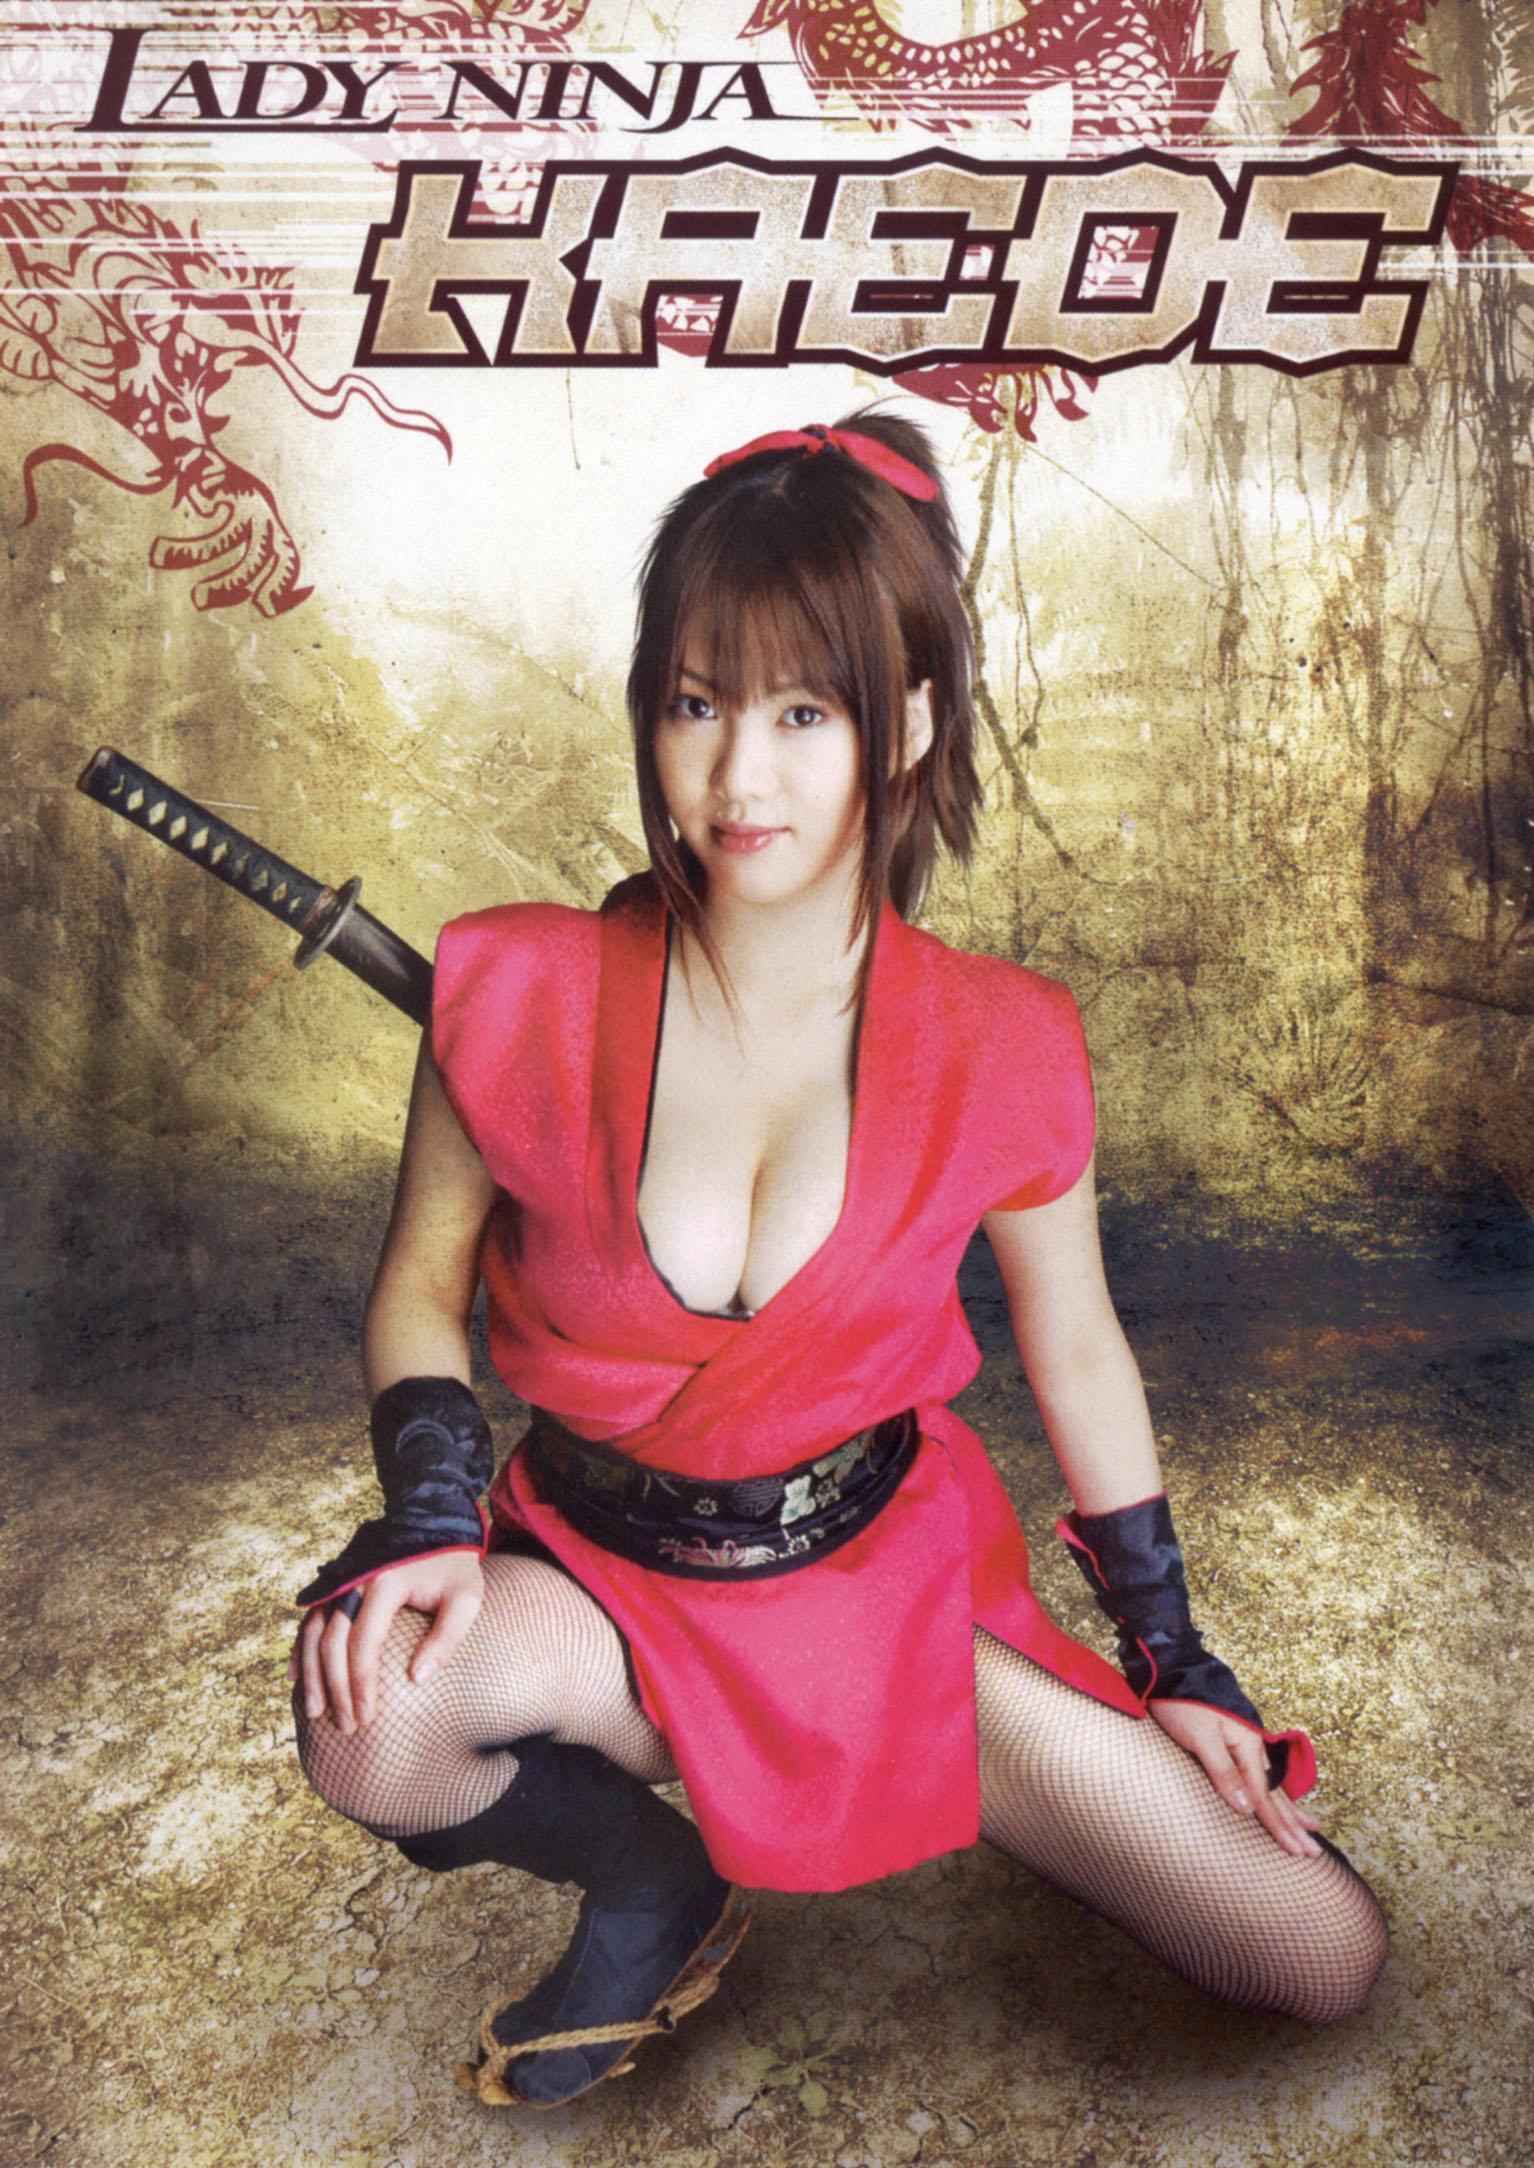 Ninja cinese xxxdowloud video hentia image